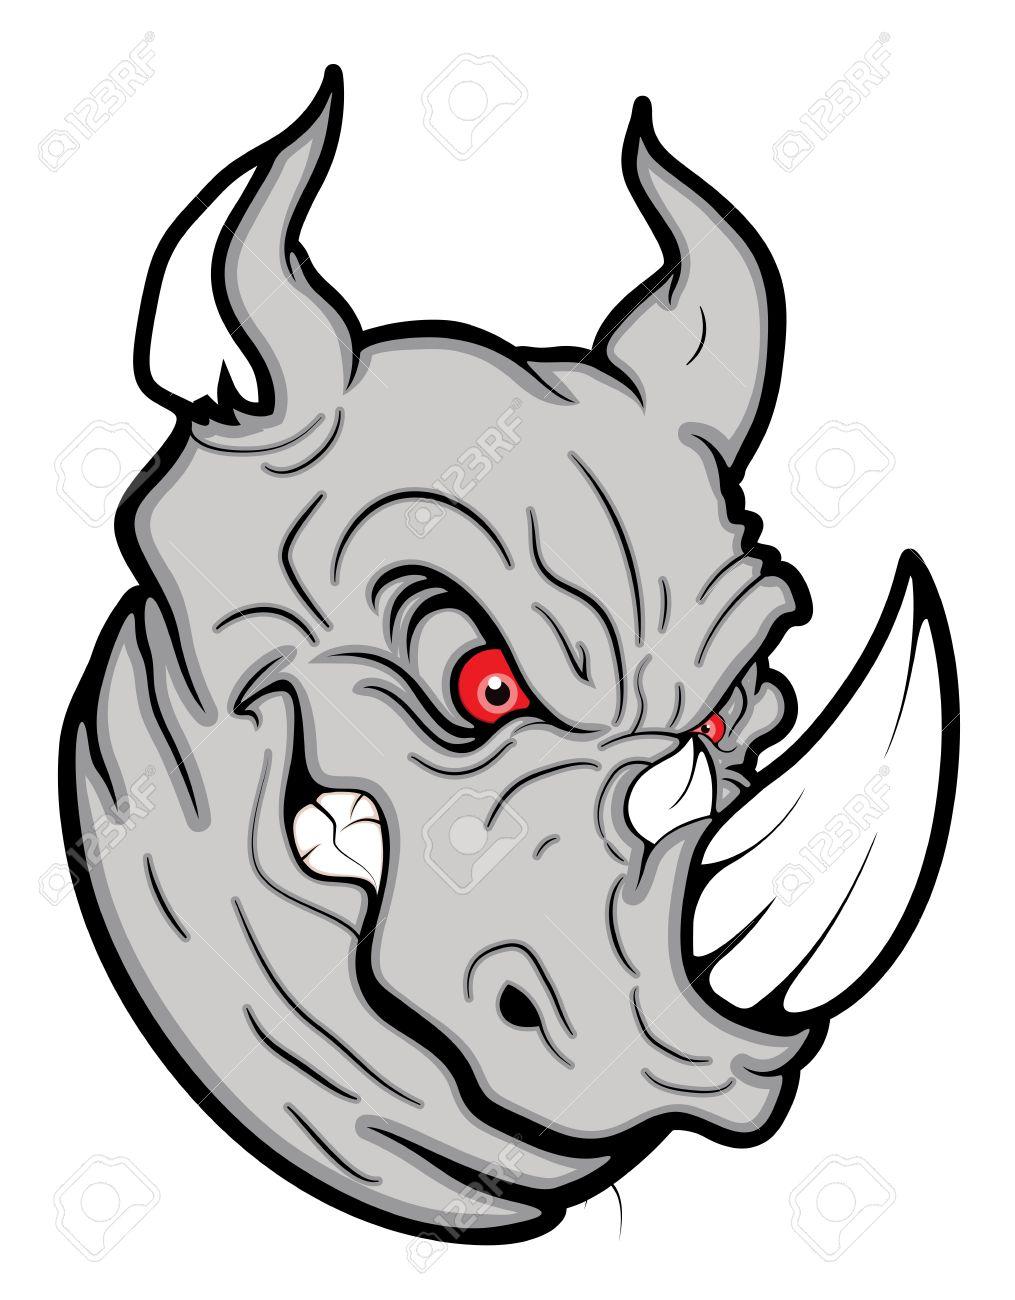 Cartoon Rhino Drawing at GetDrawings com | Free for personal